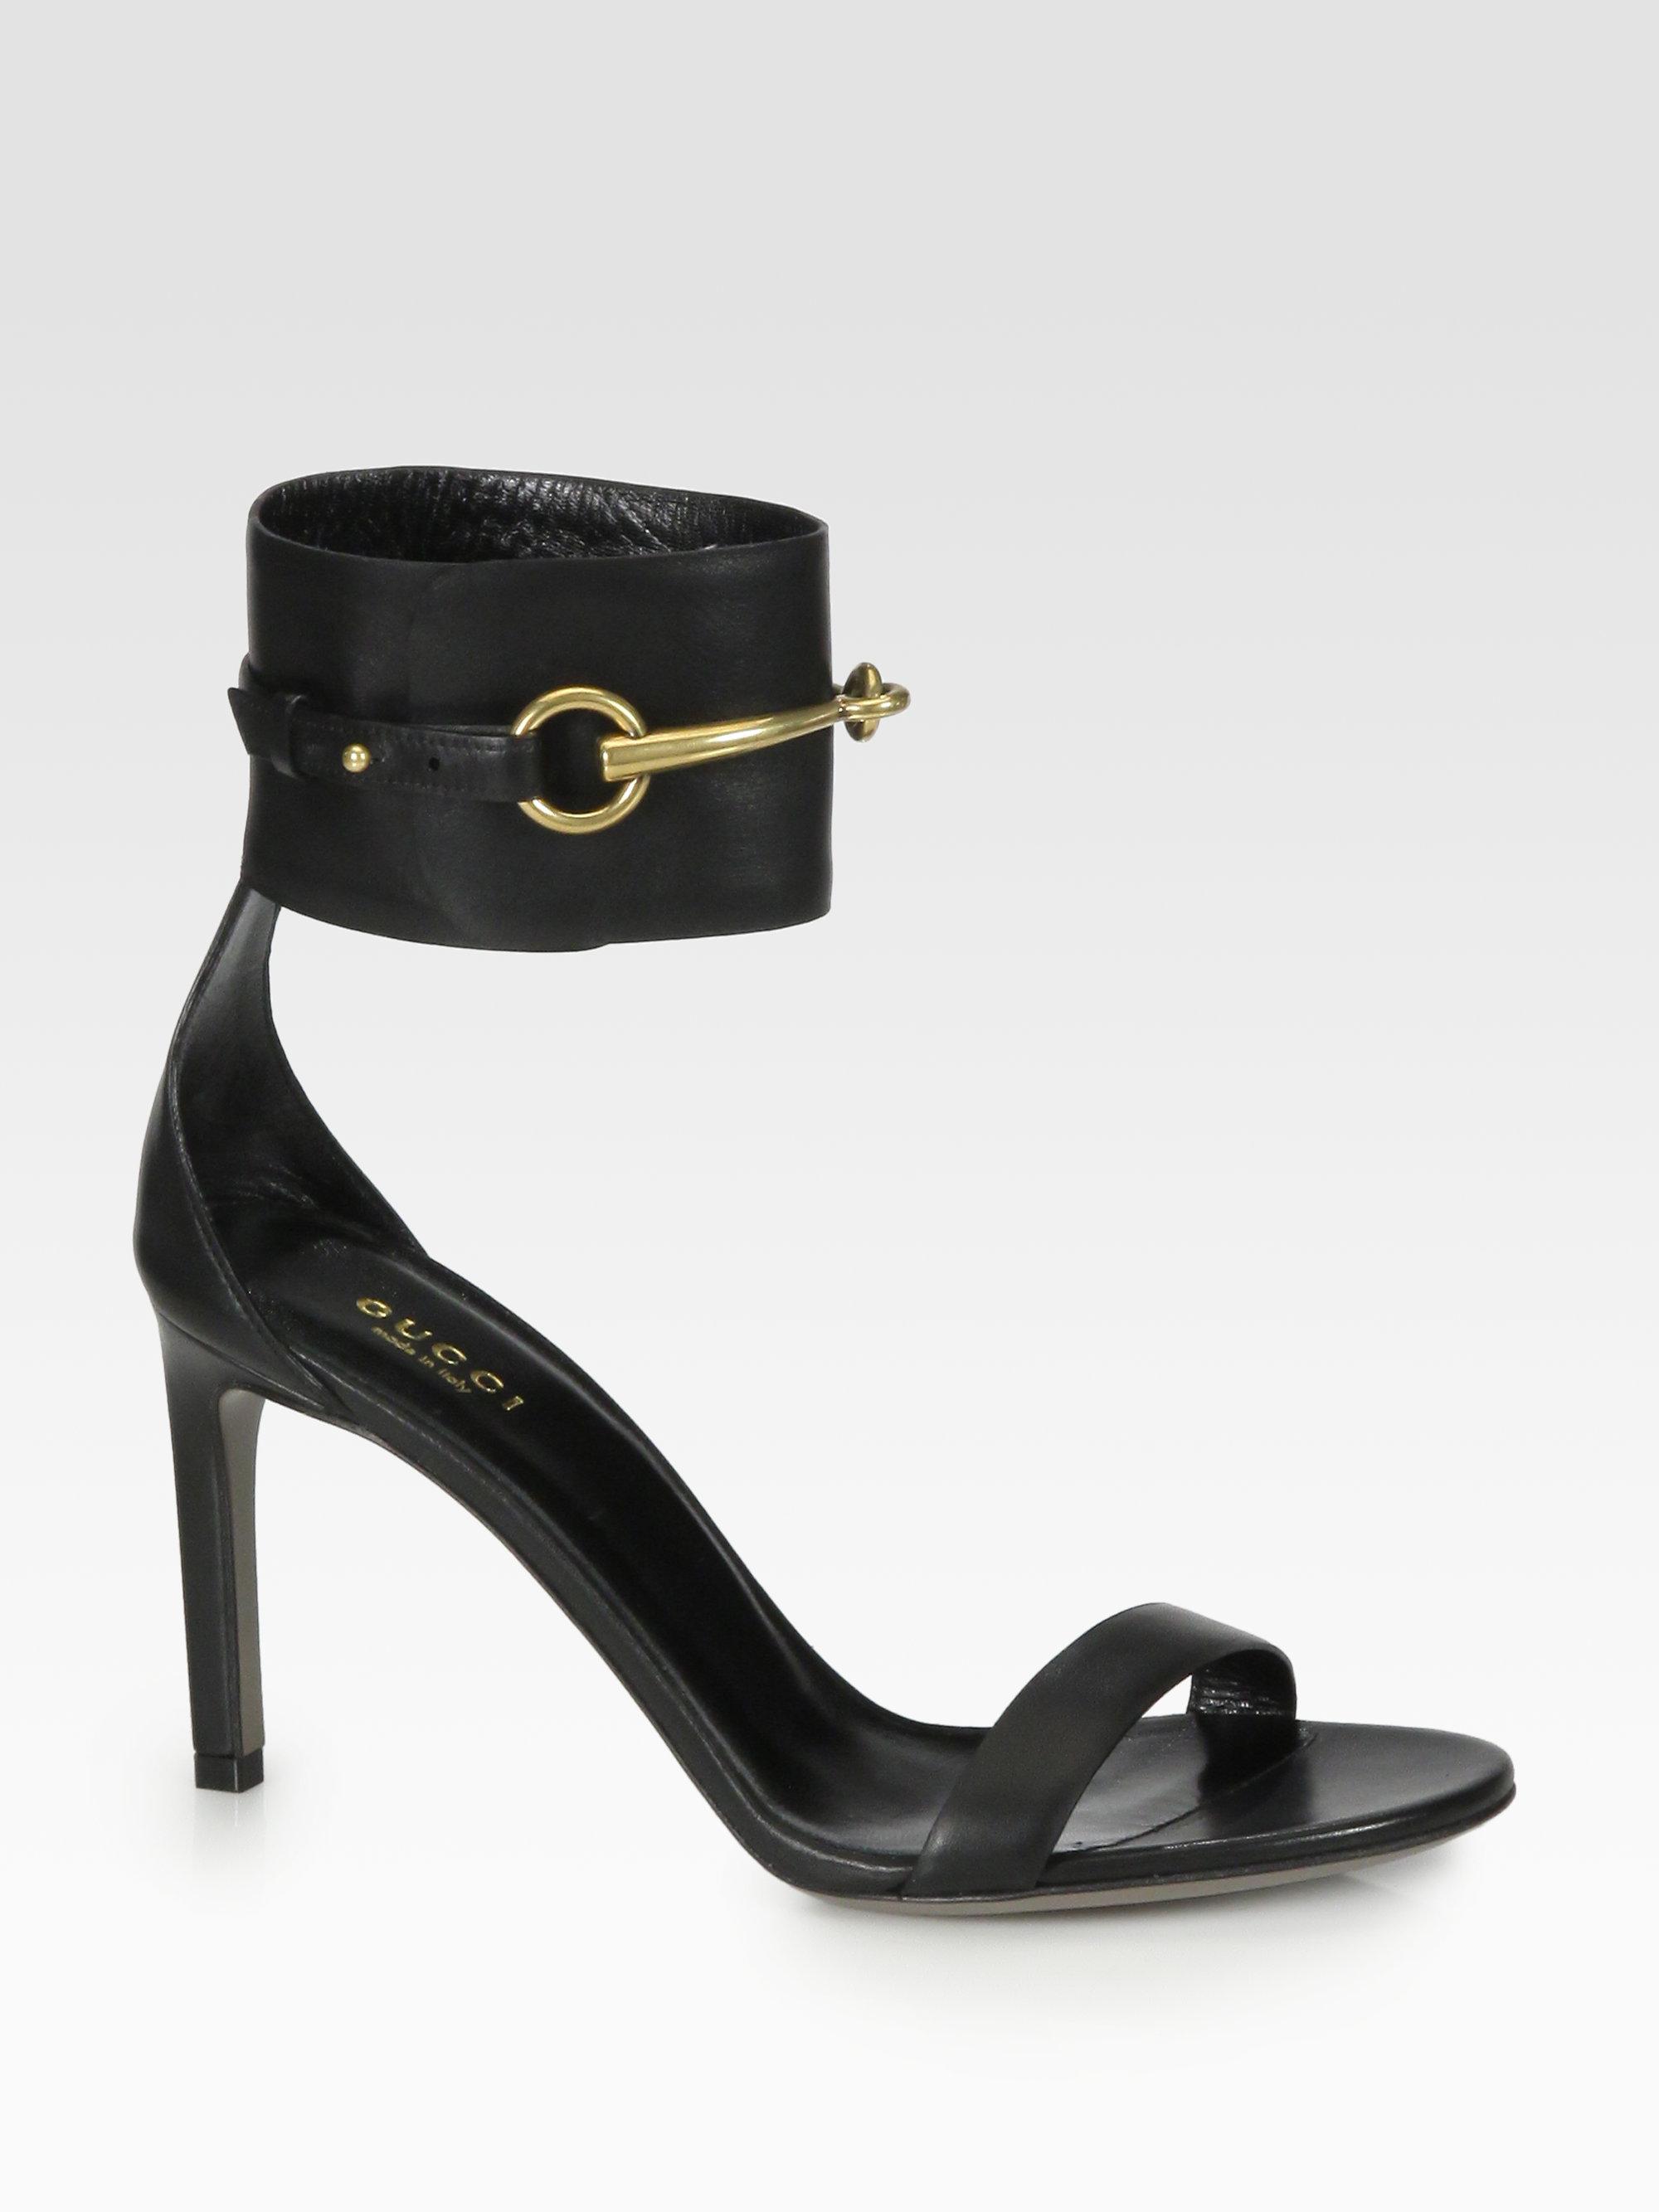 Lyst Gucci Ursula Leather Horsebit Sandals In Black